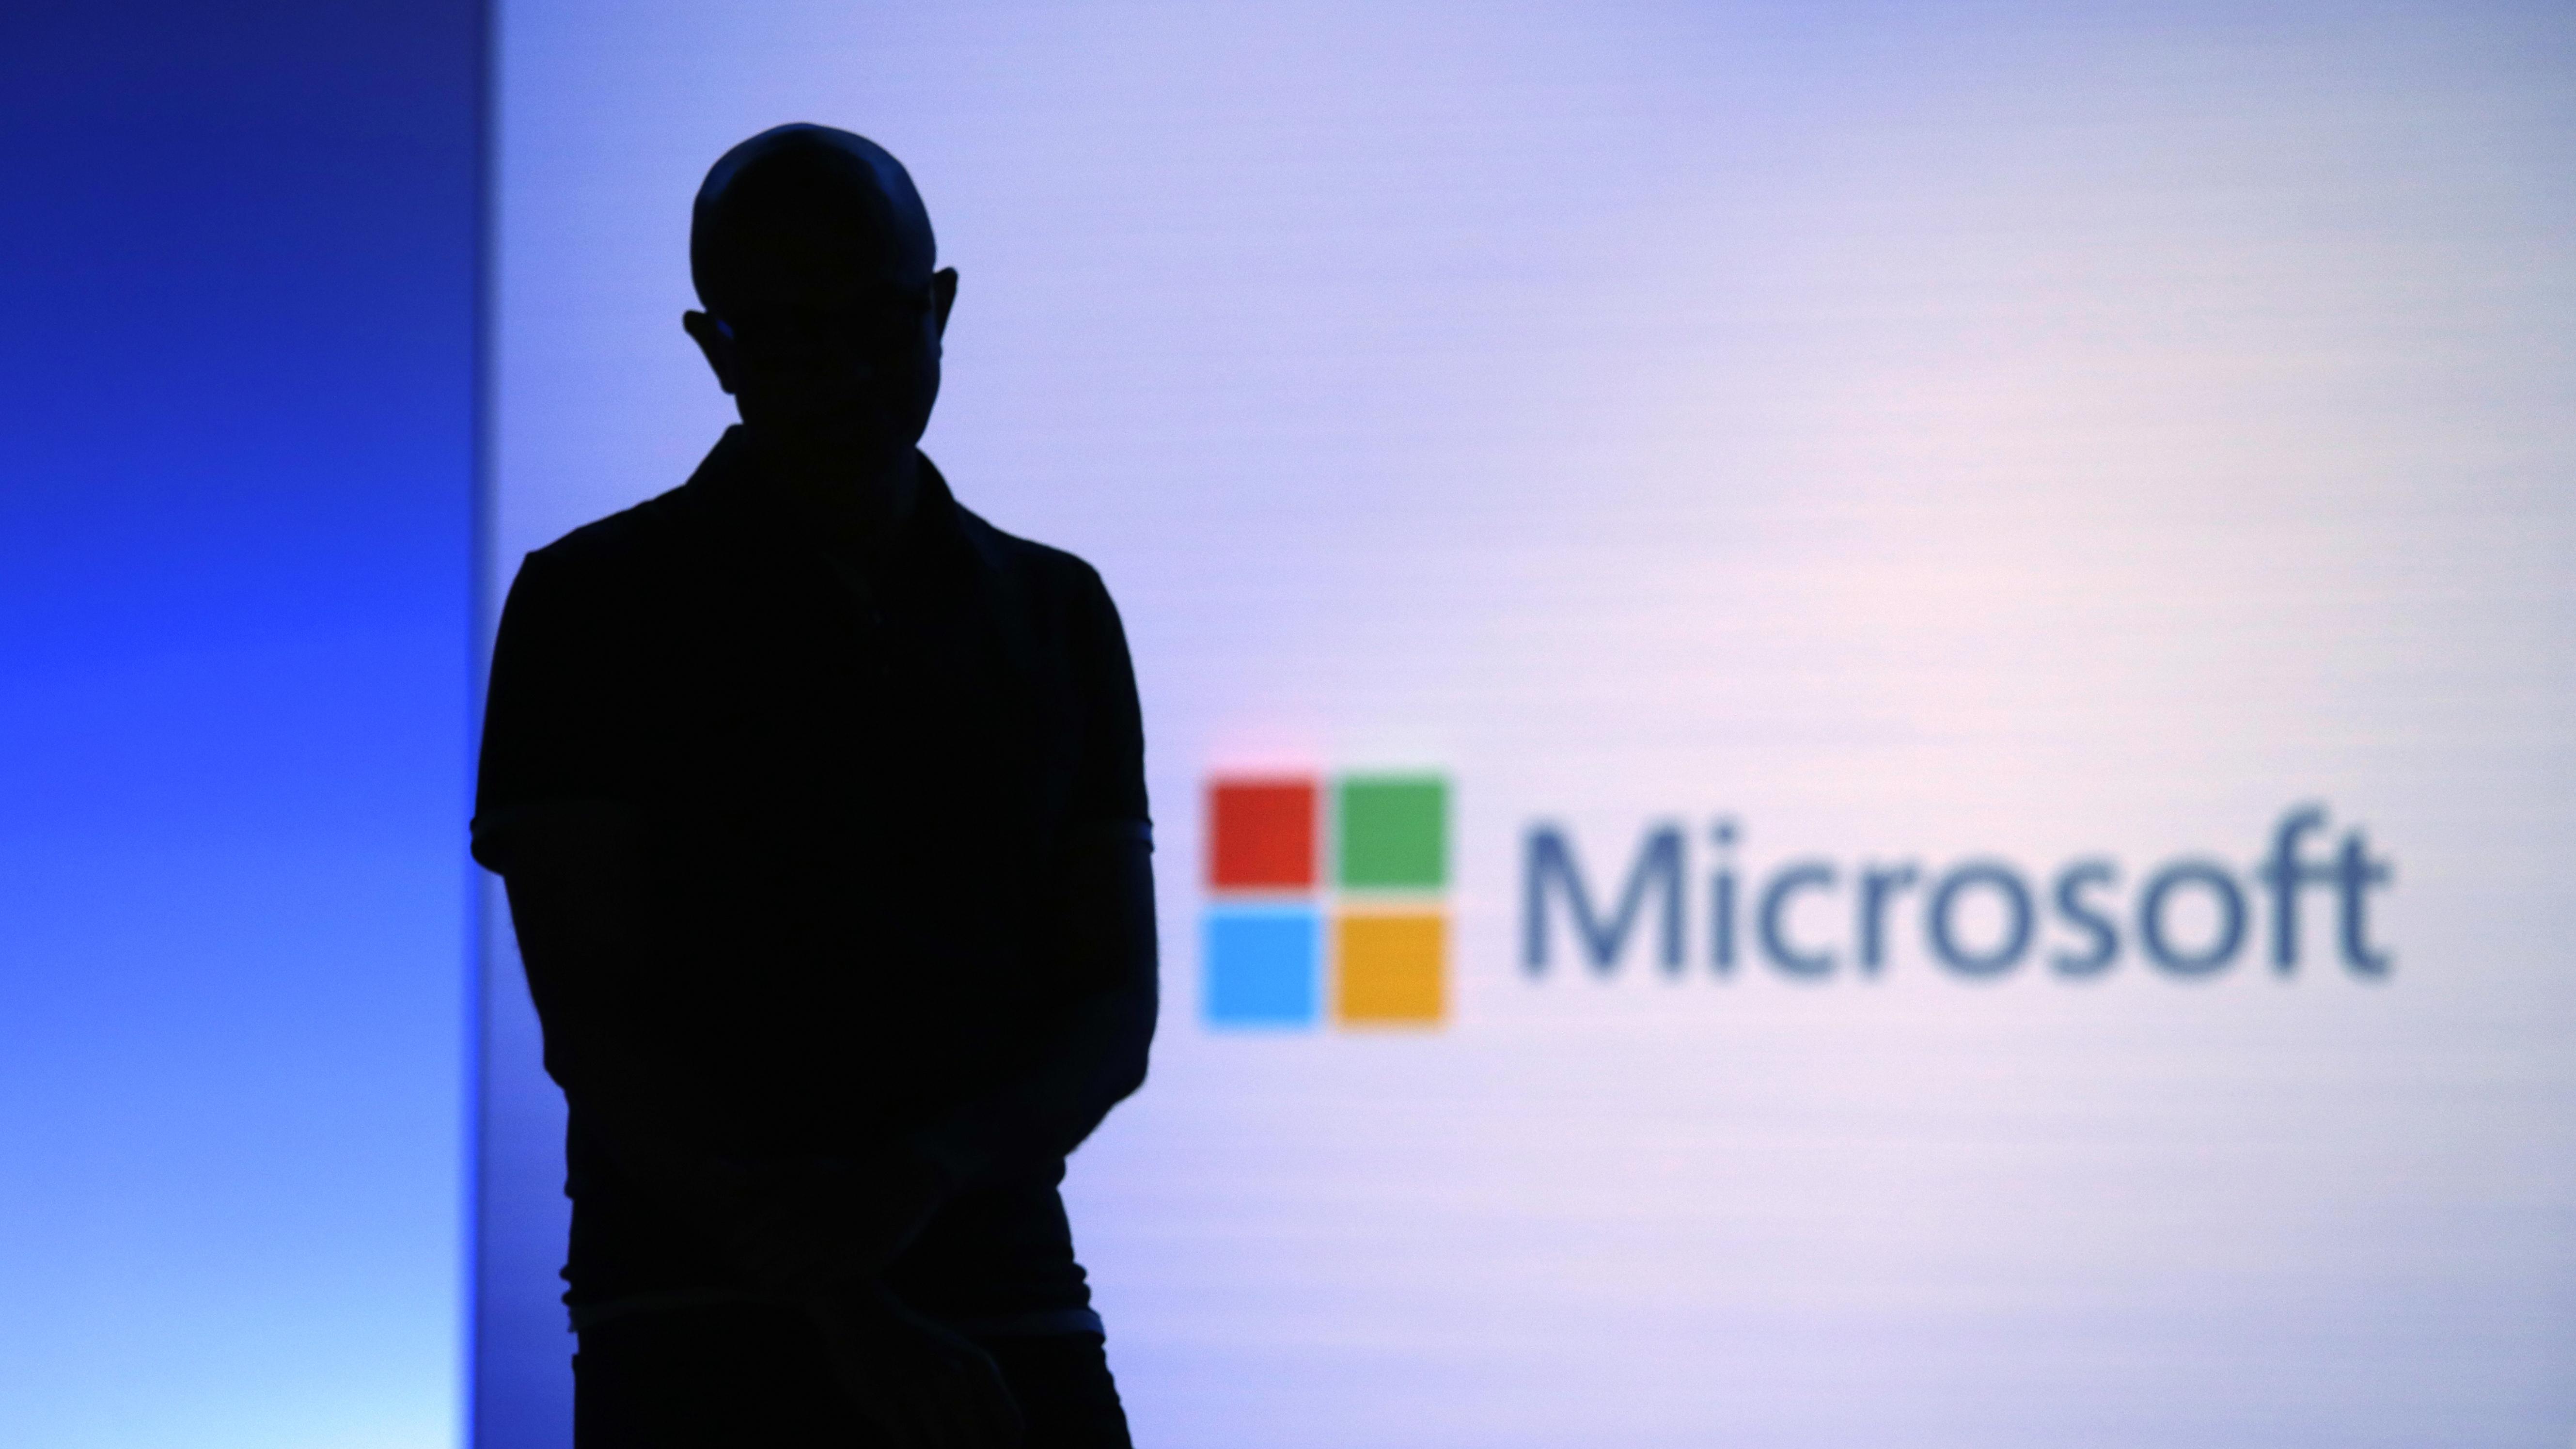 Microsoft has agreed to buy GitHub for $7 5 billion — Quartz